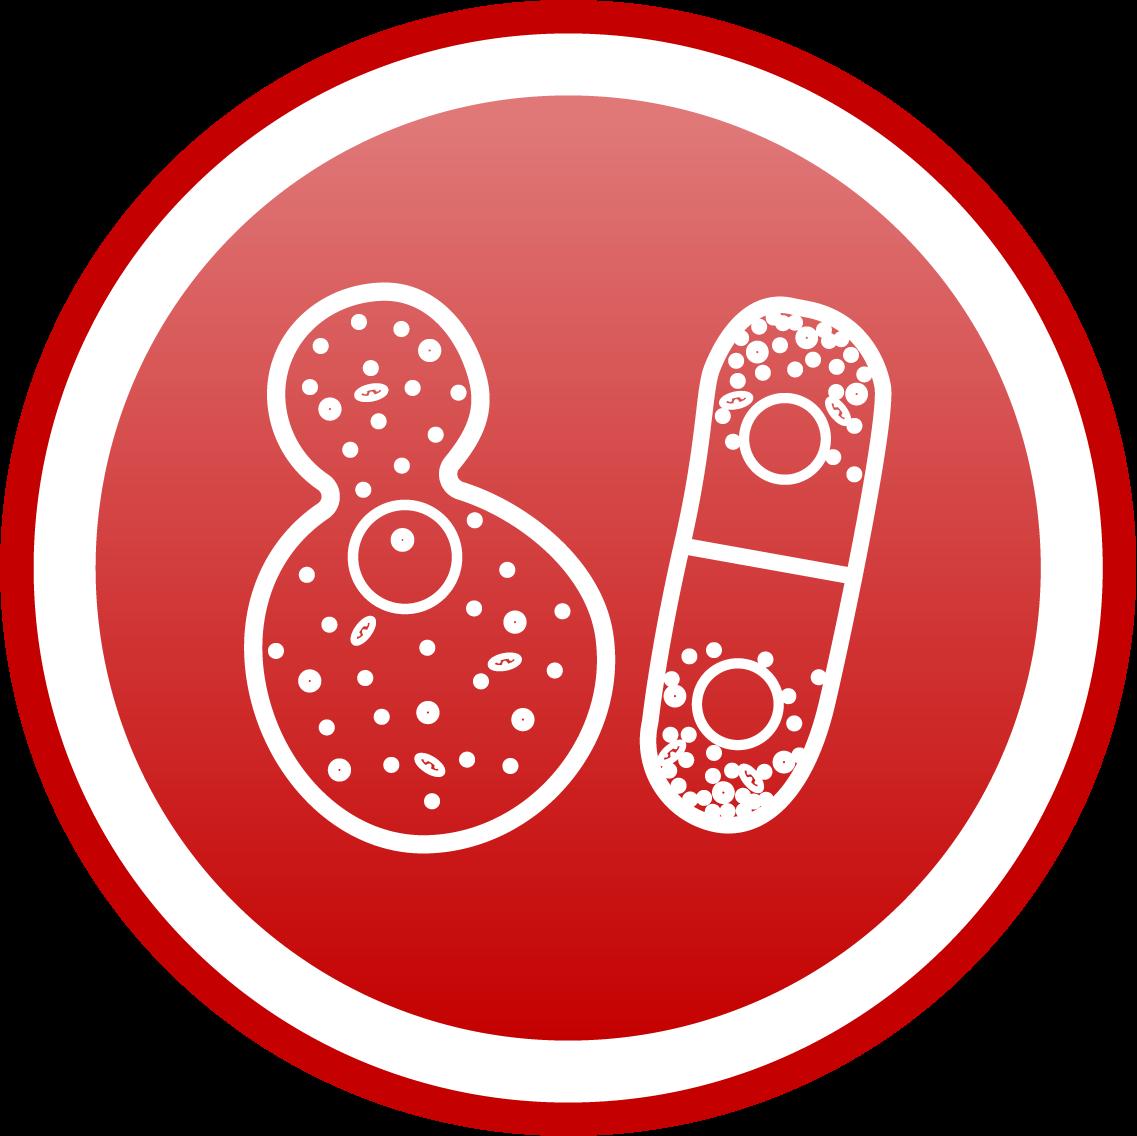 yeast pack-cherrybiotech-organ-on-a-chip-cherrytemp